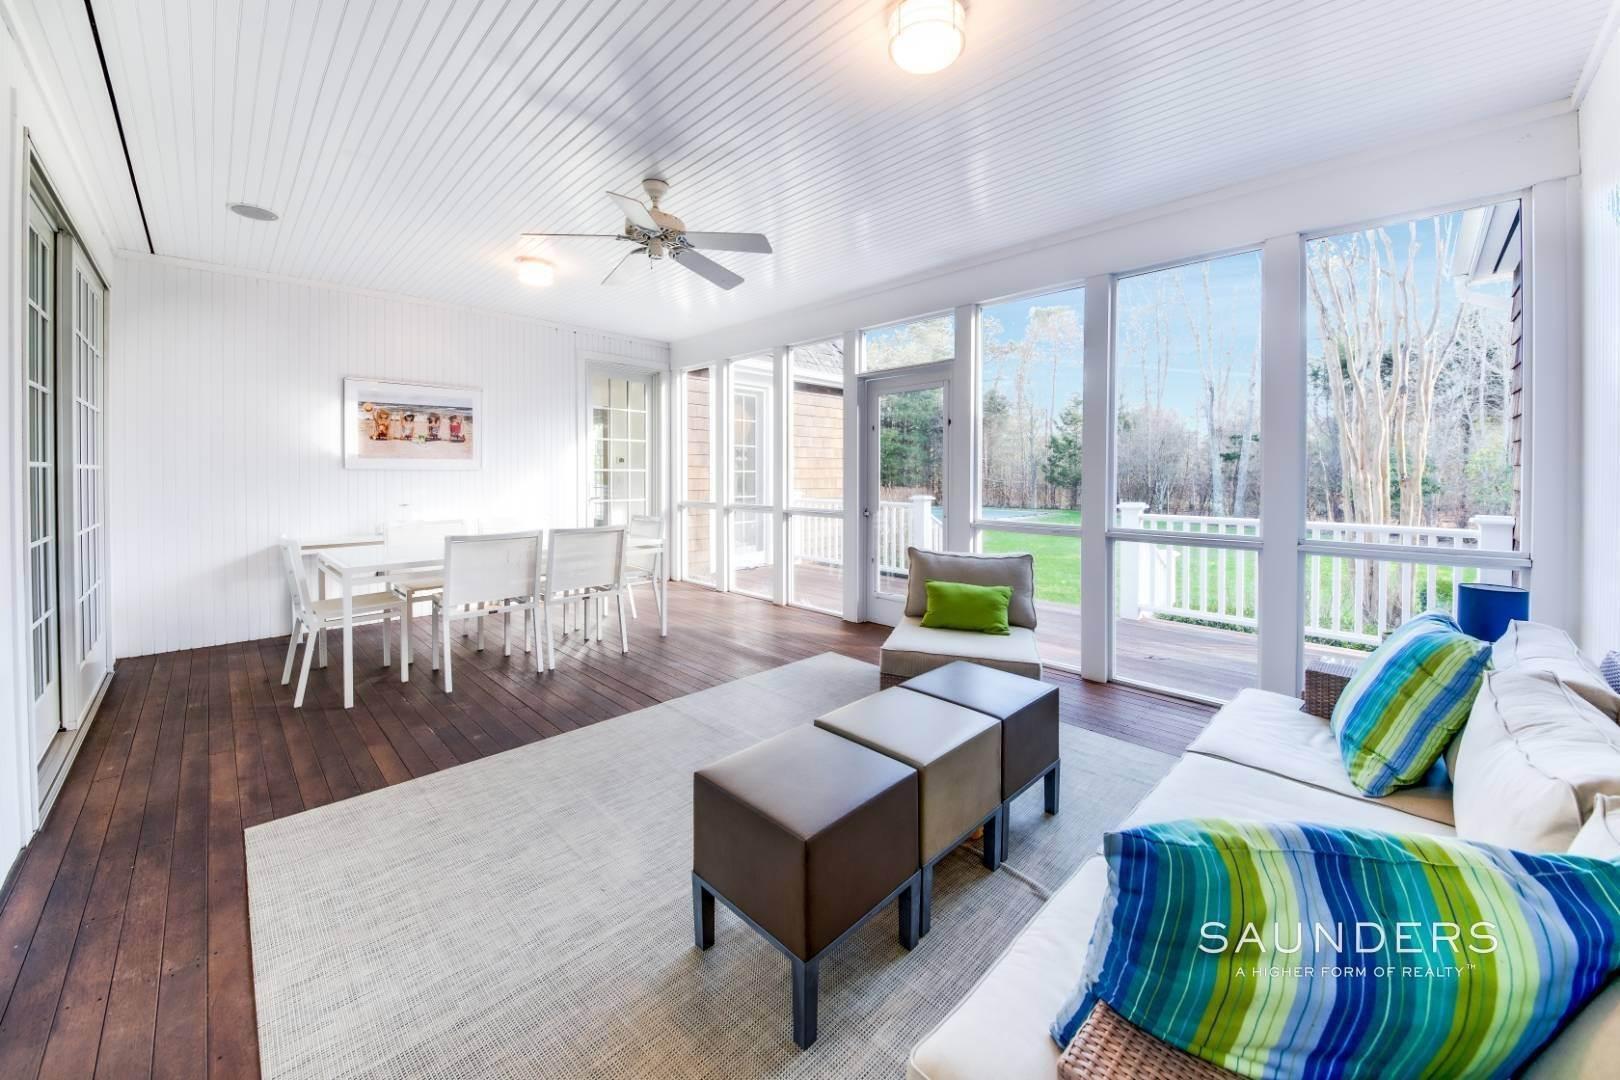 10. Single Family Homes for Sale at Wainscott South Traditional Near Beach Lane 10 Merriwood Drive, Wainscott, East Hampton Town, NY 11975